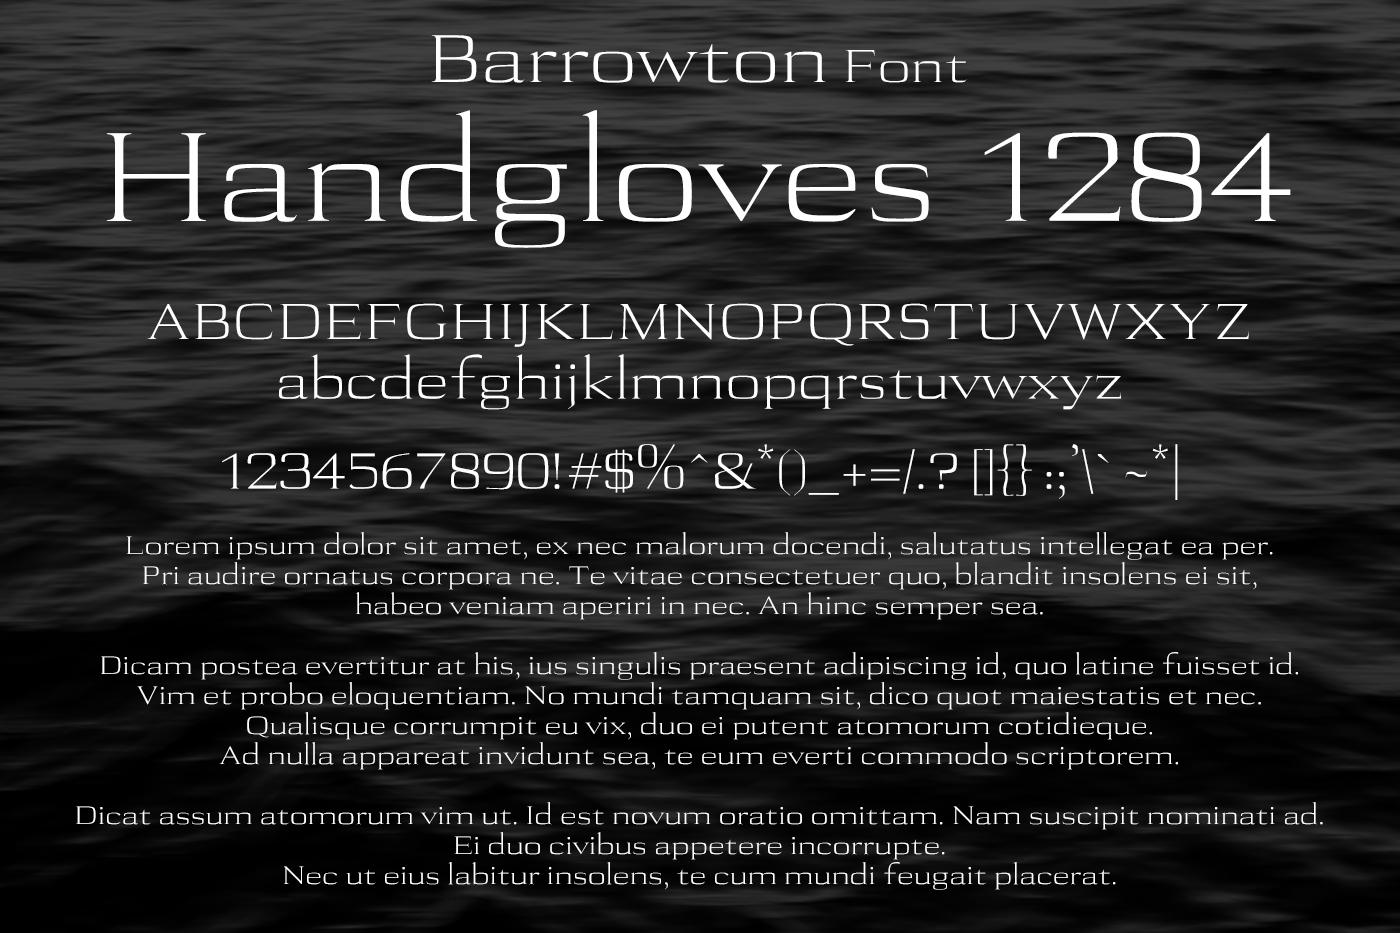 Barrowton Font example image 2